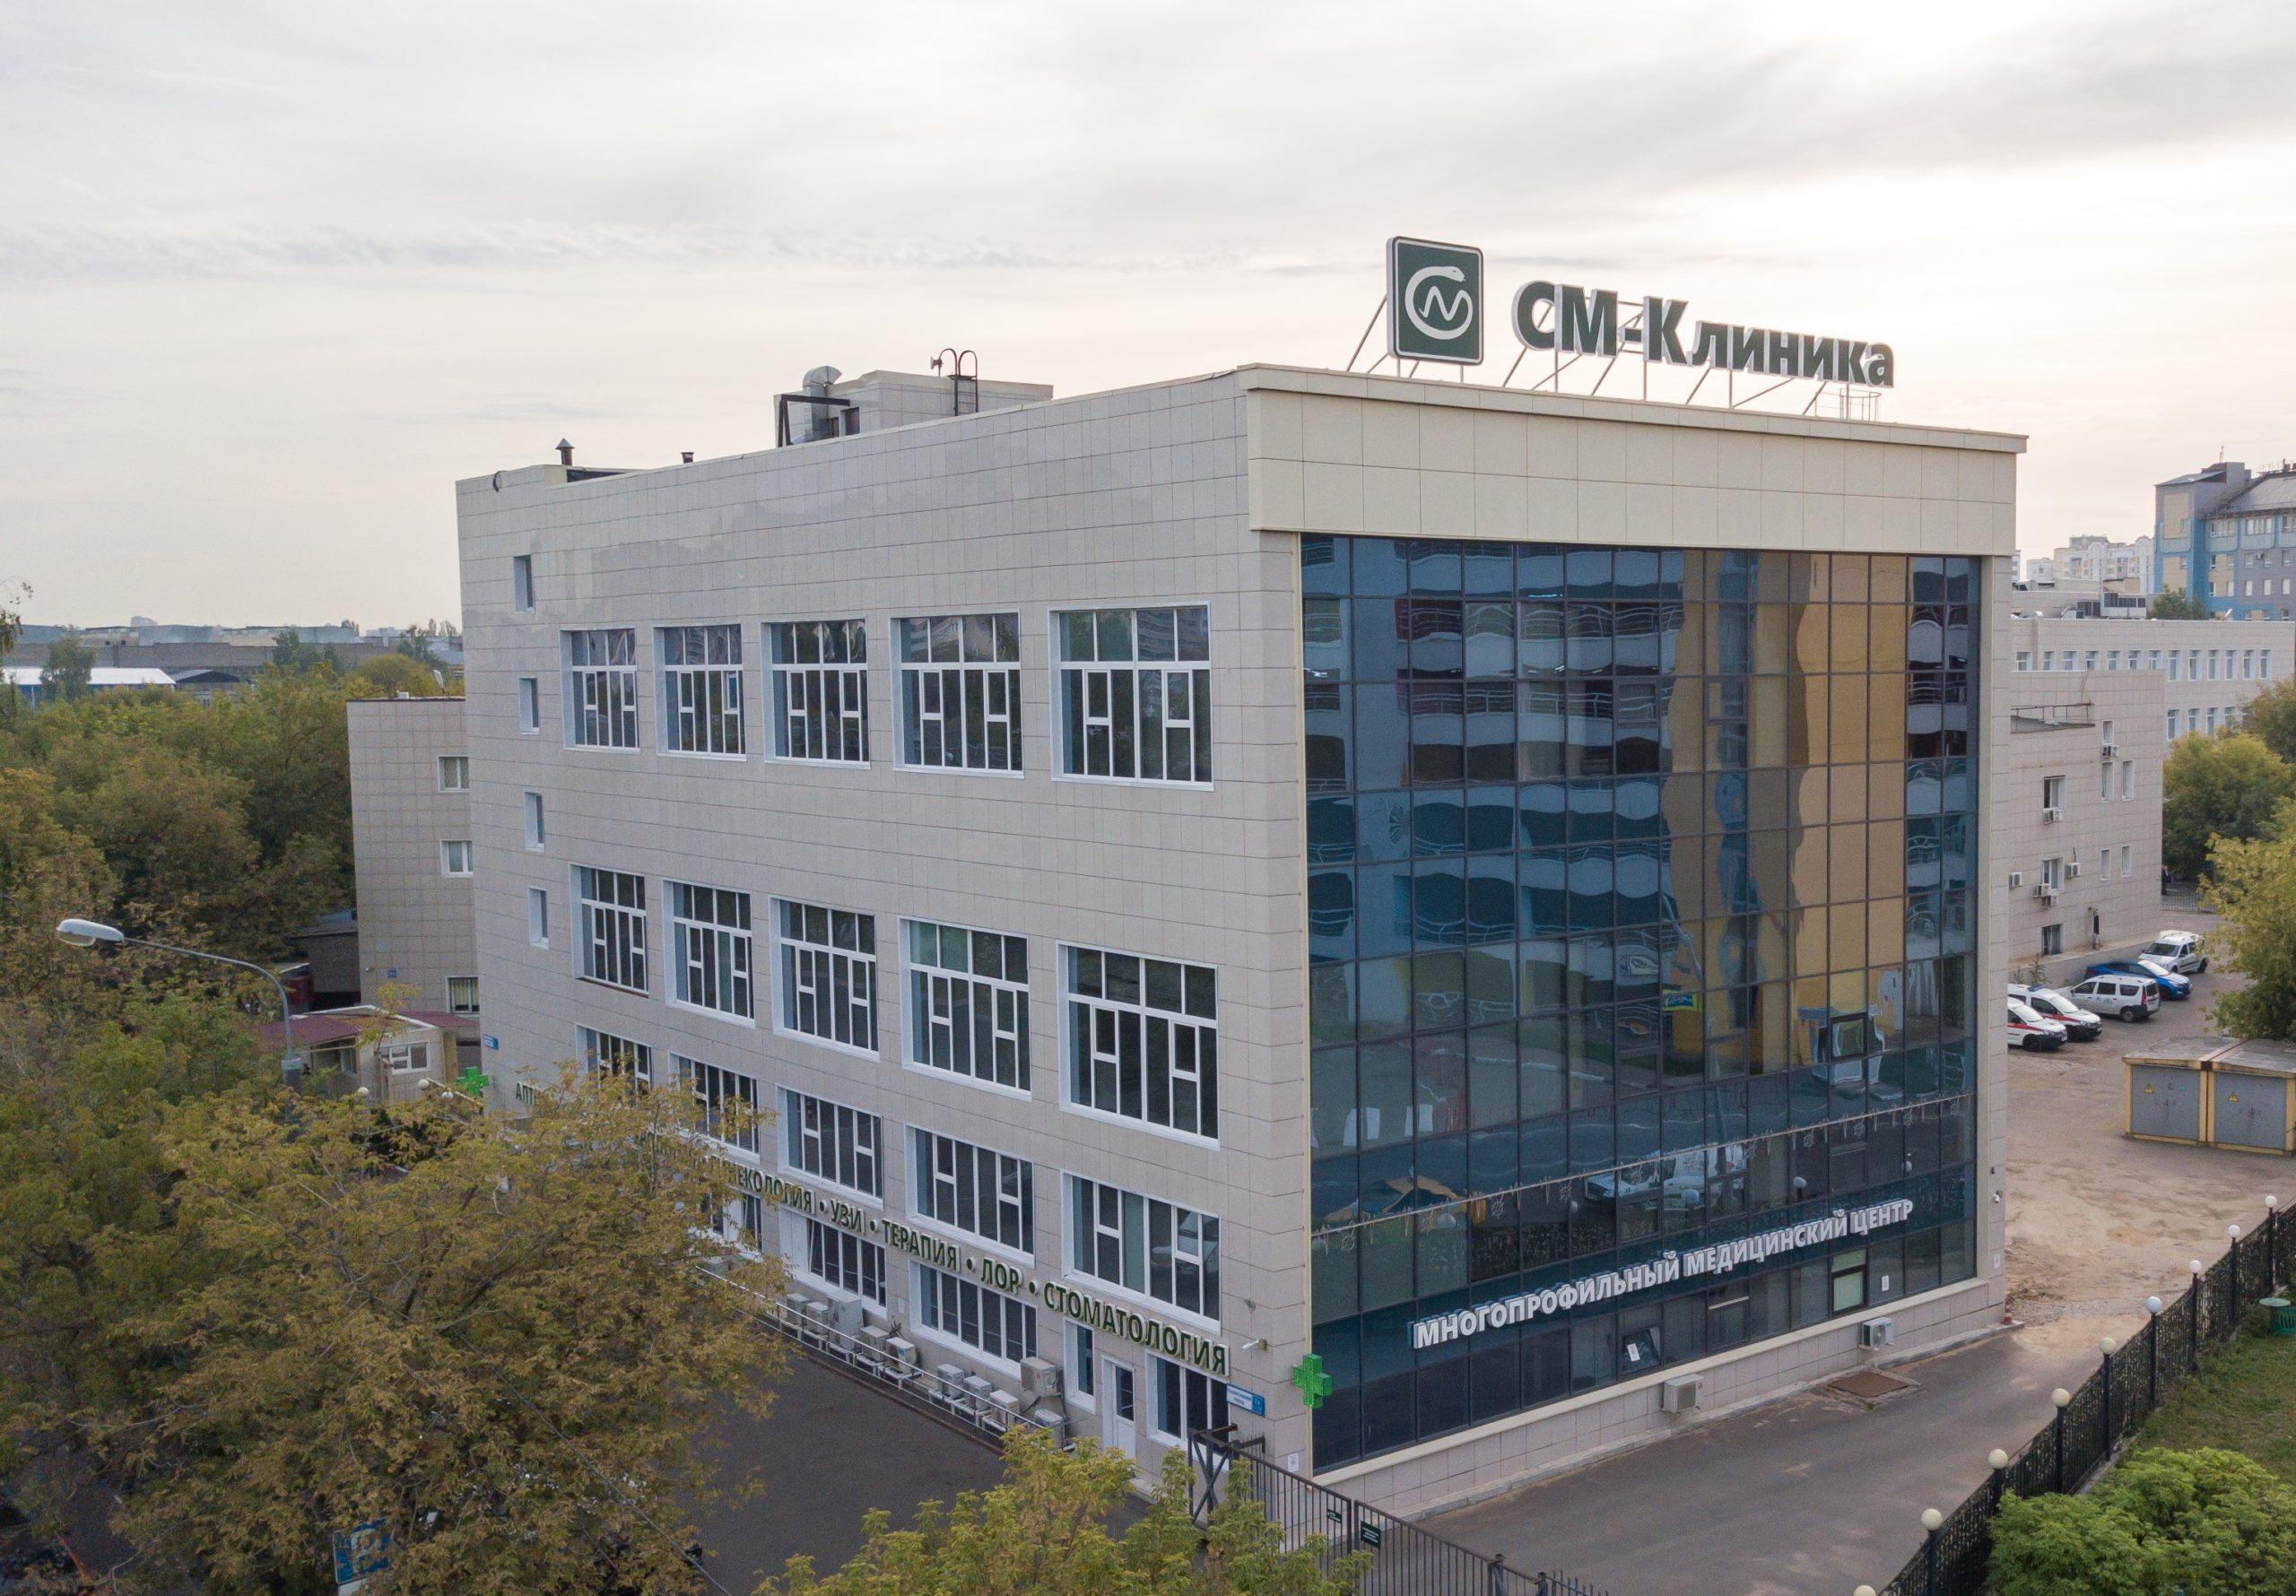 SM-Clinic (Staropetrovsky)